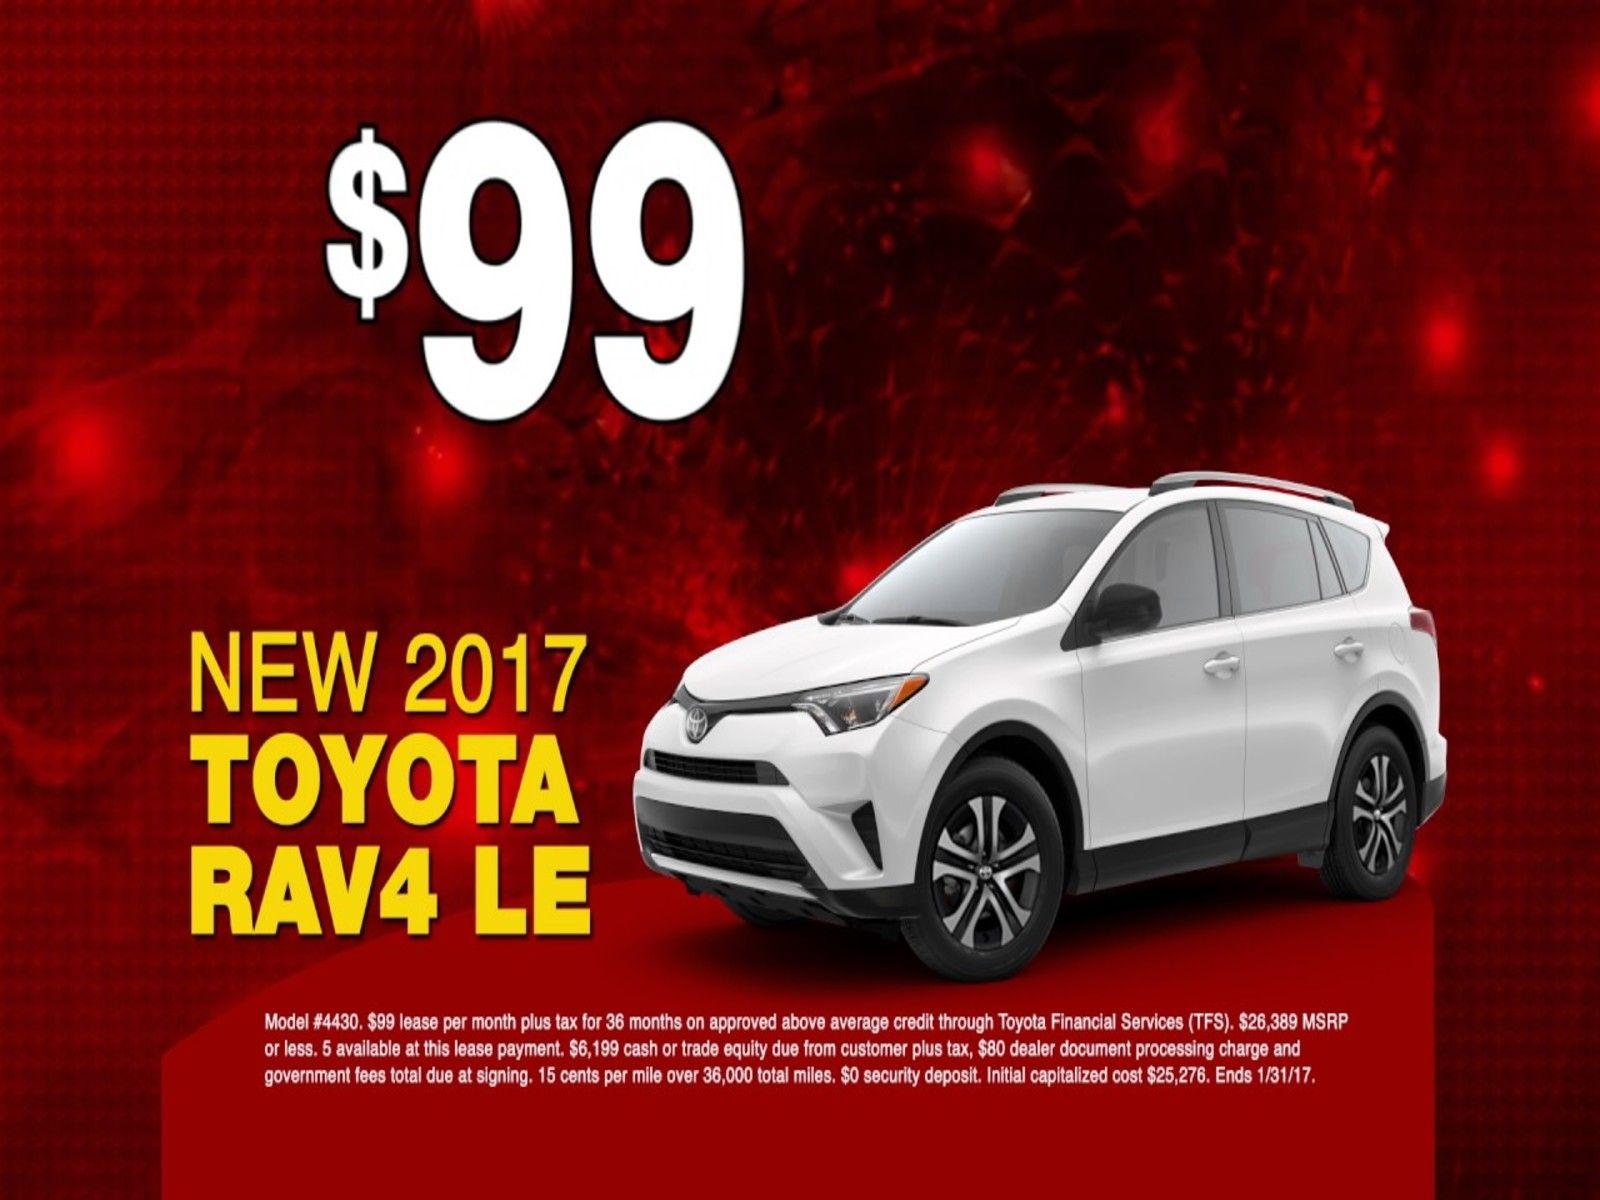 Toyota Lease Deals >> Toyota Rav4 Lease Deals World Car Brands Lease Deals Toyota Rav4